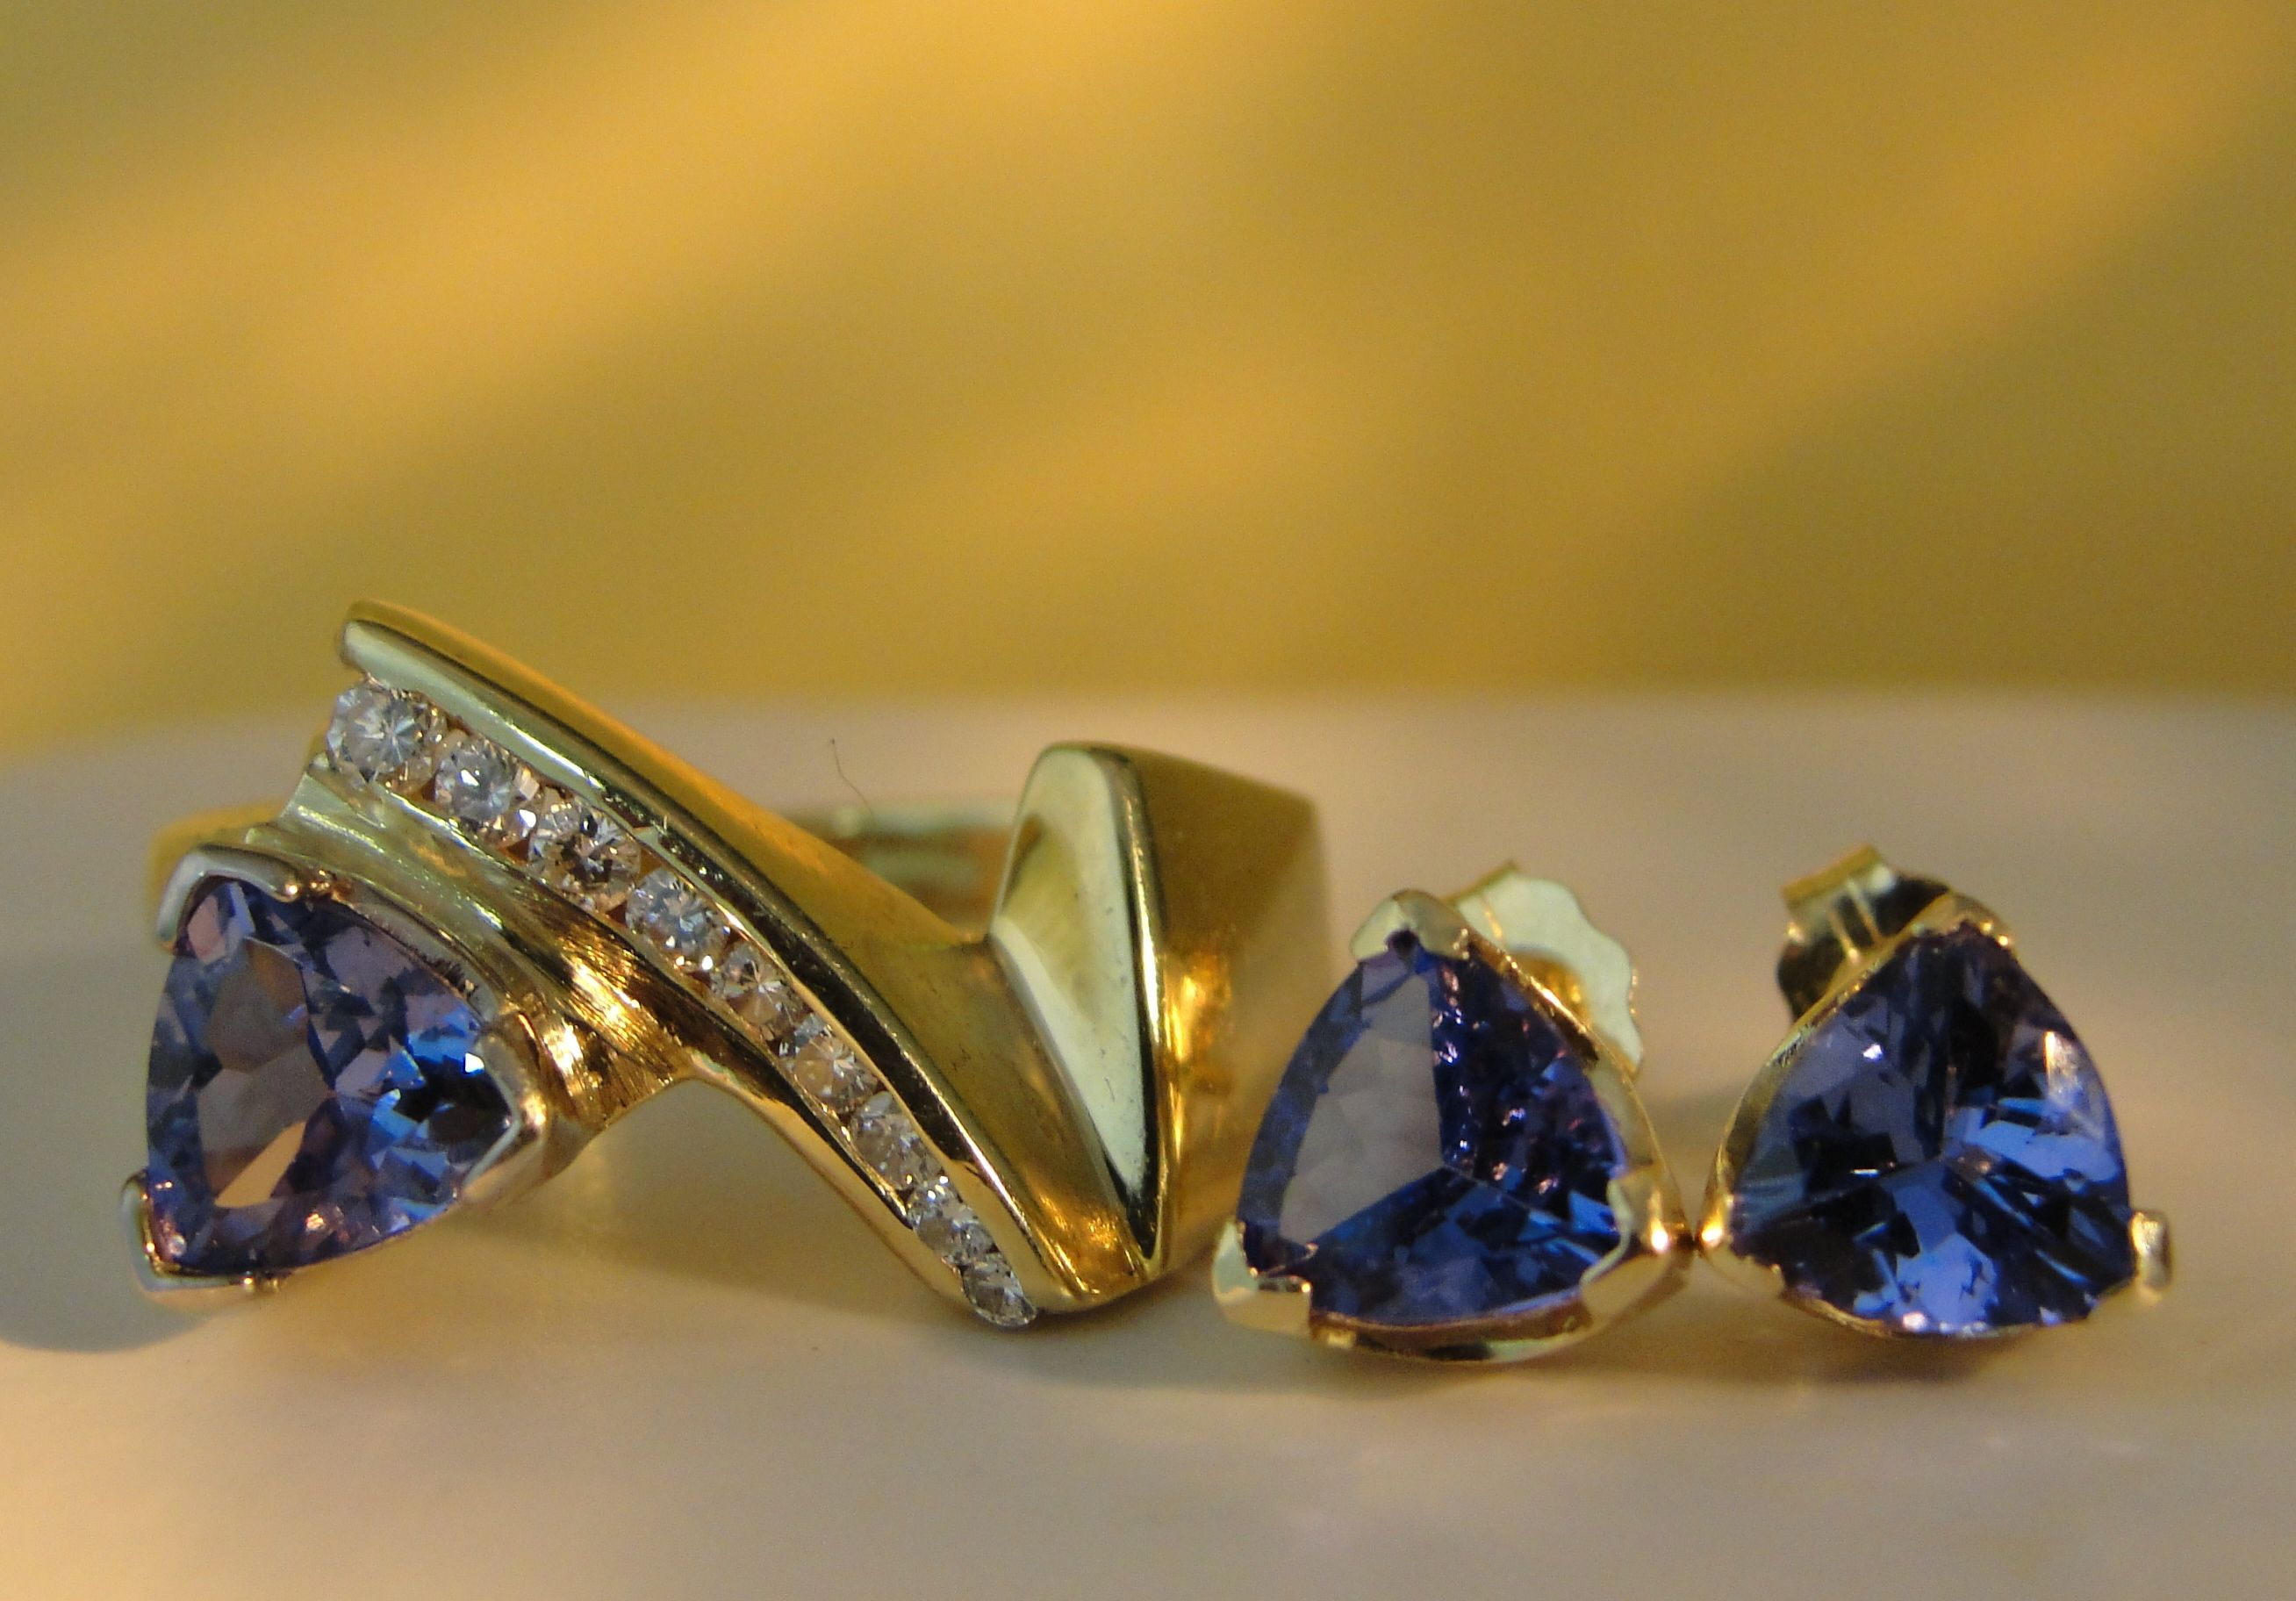 Natural Trillion Tanzanite Solid 14K Yellow Gold Diamond Ring and